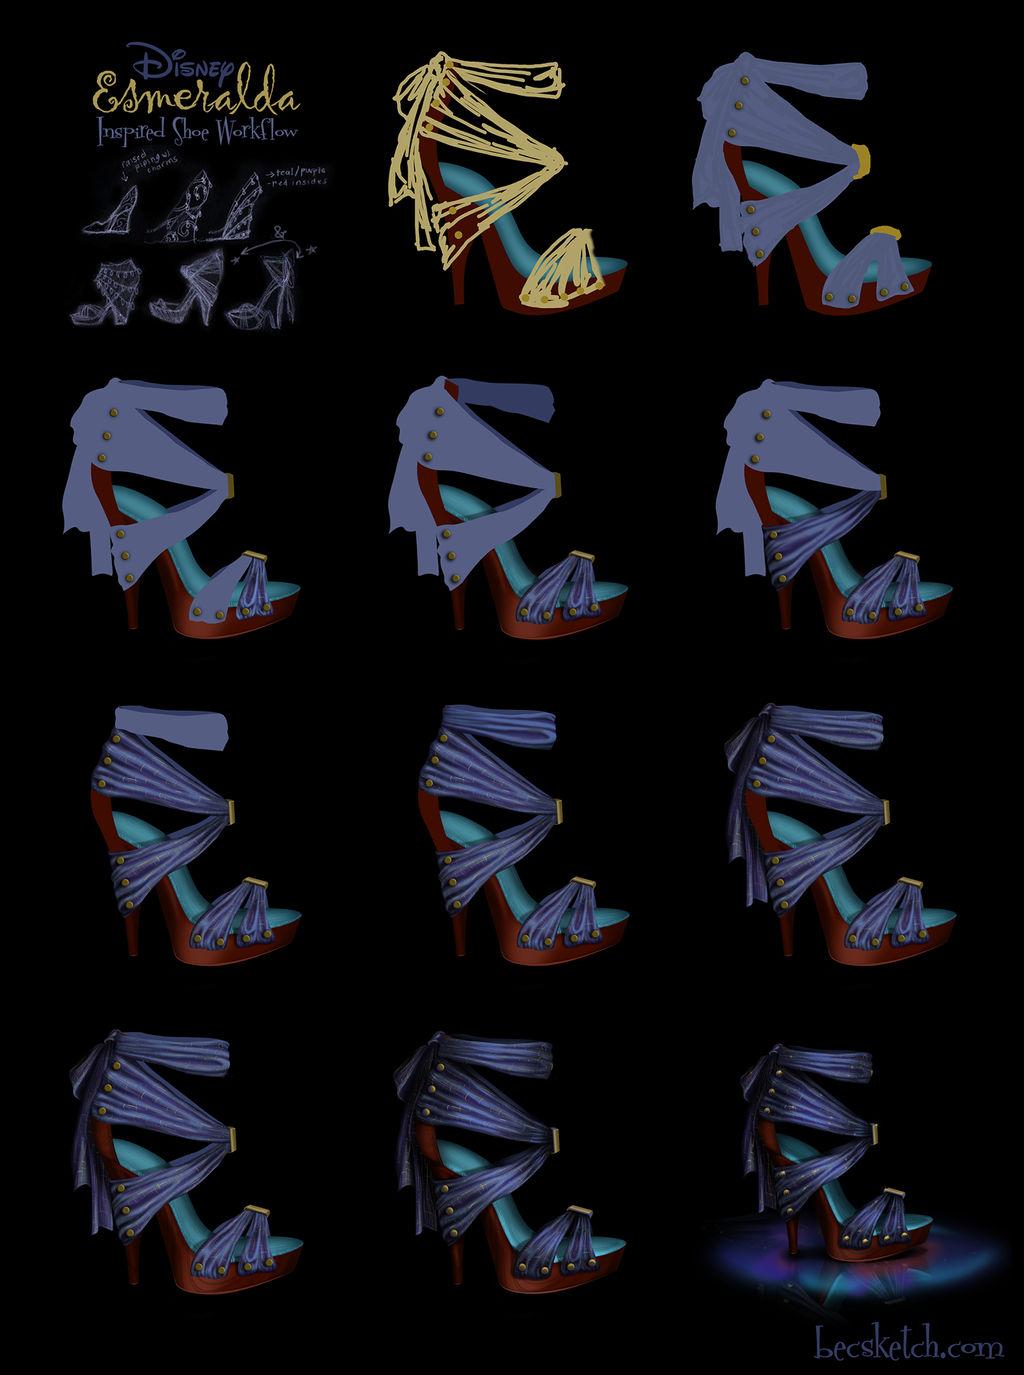 Esmeralda Inspired Shoe - Disney Sole Workflow by becsketch